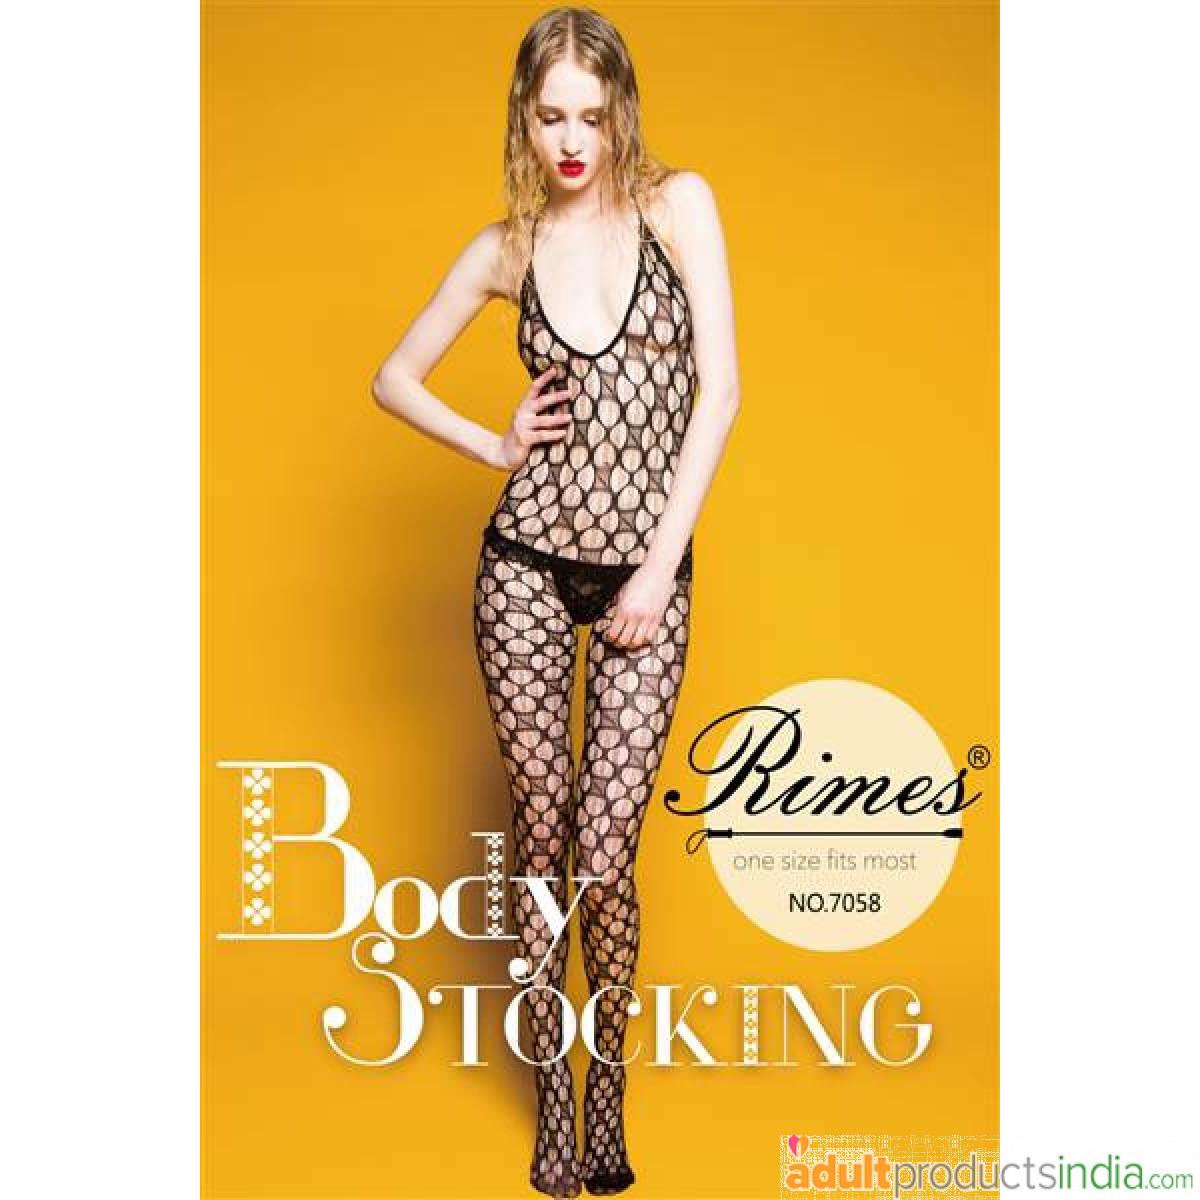 Rimes Bodystocking No. 7058